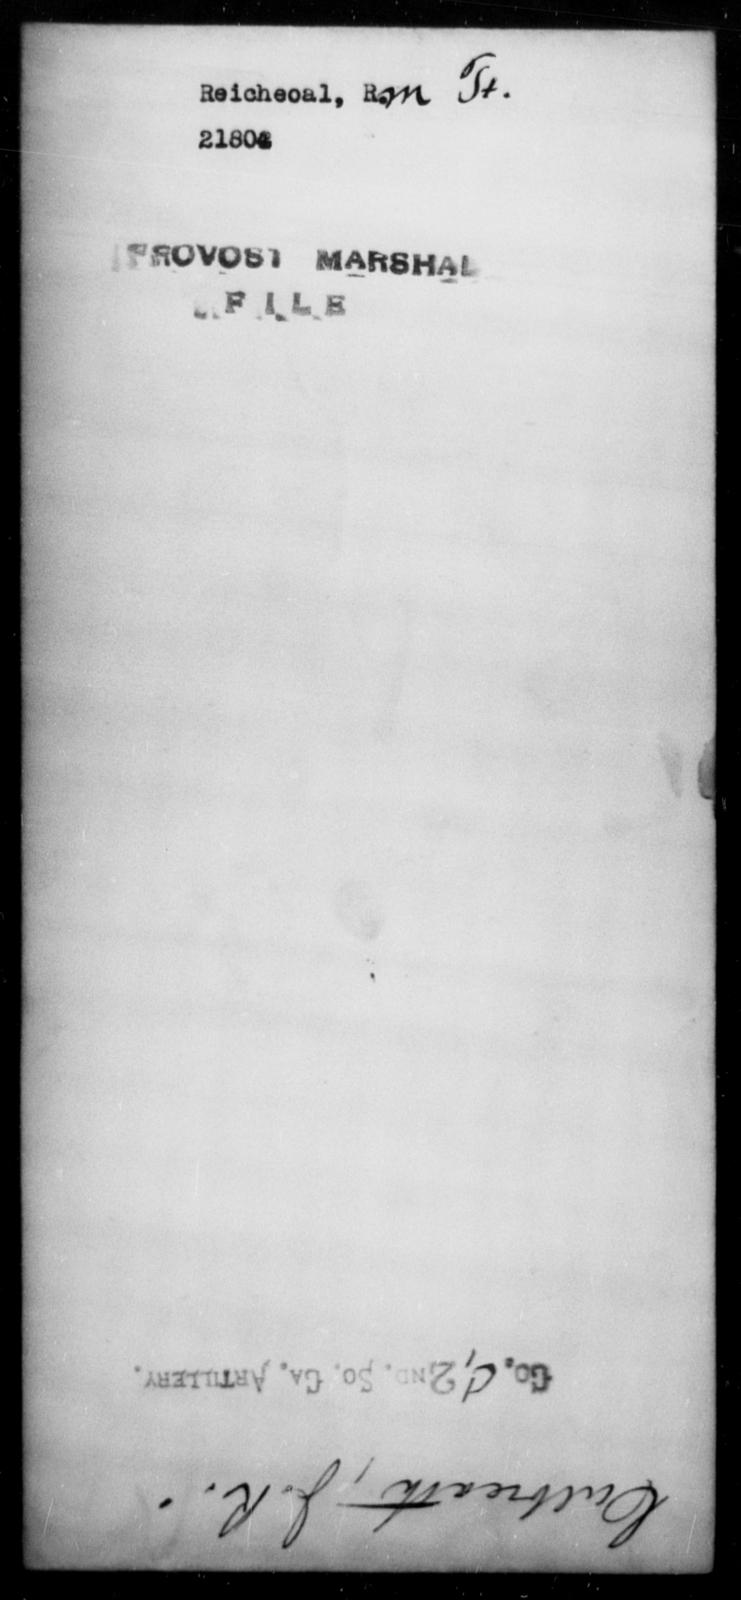 Reicheoal, R M - State: [Blank] - Year: [Blank]